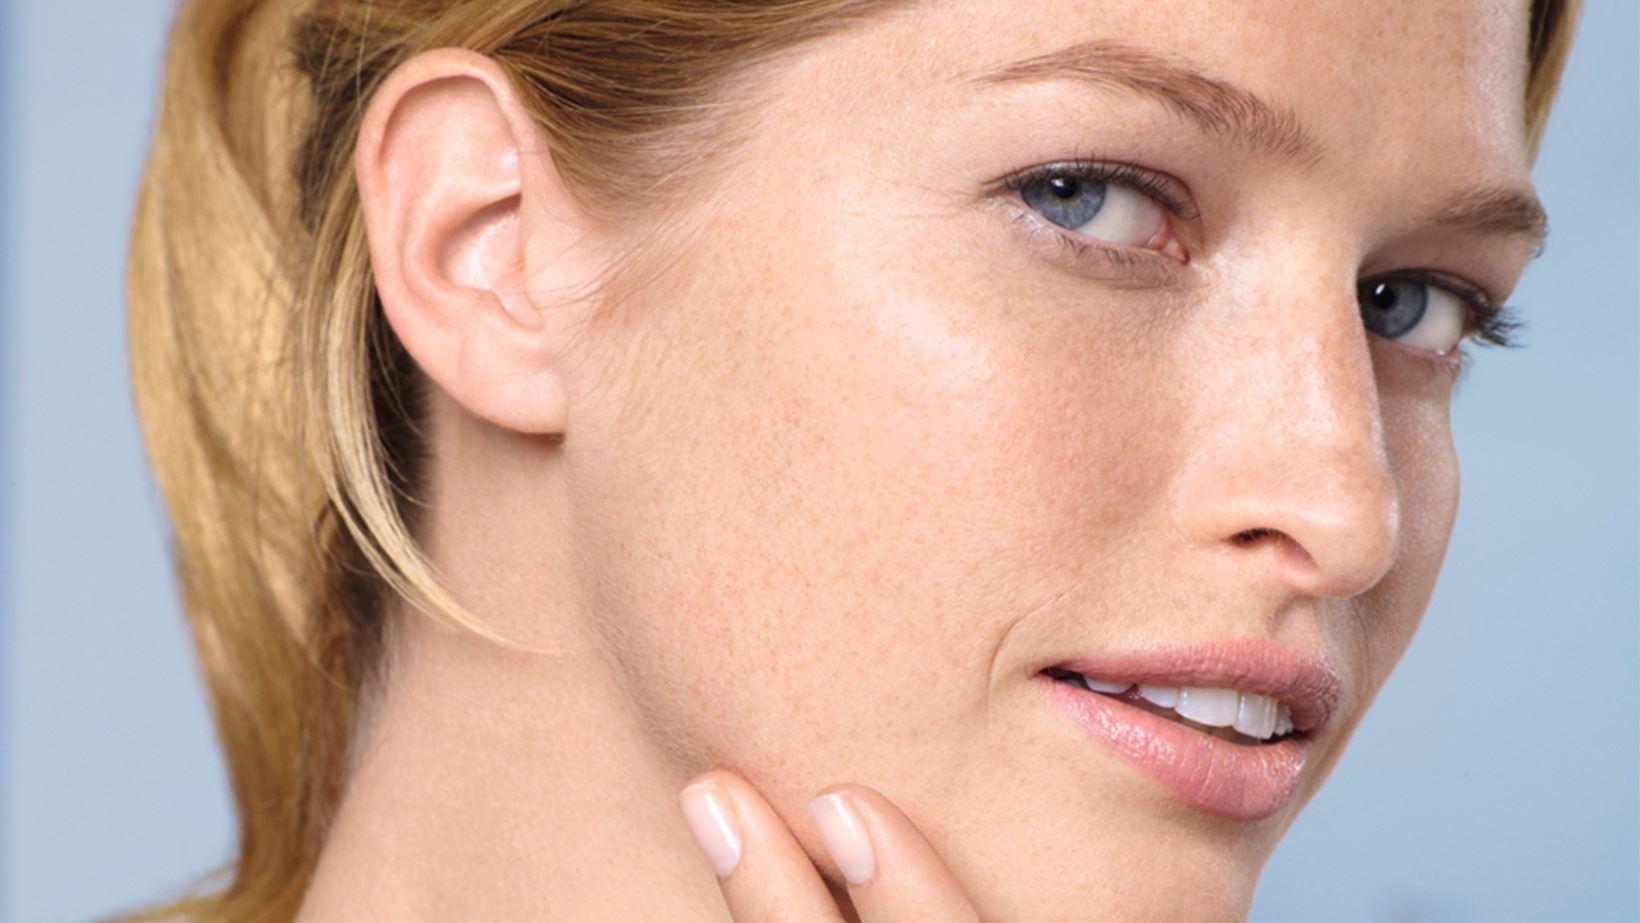 tratamiento piel deshidratada